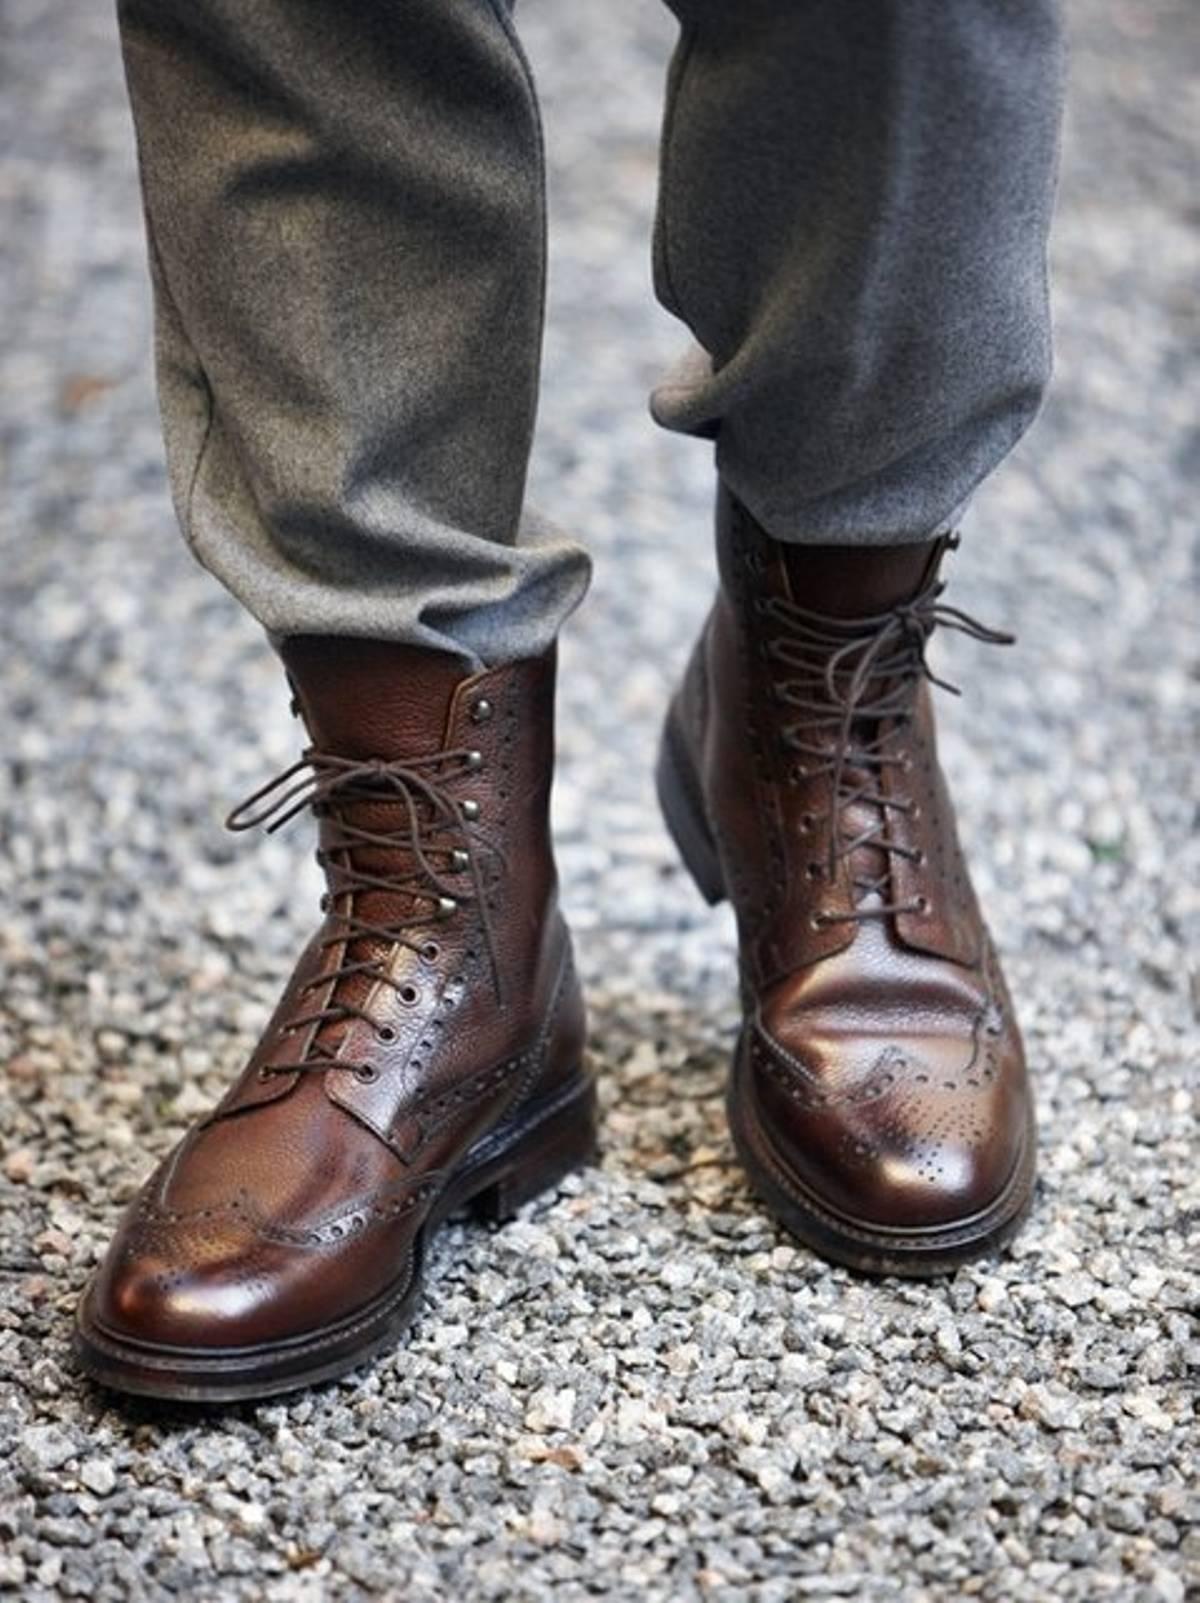 1b40b950_Crockett-Jones-Islay-Wingtip-Boots.jpg